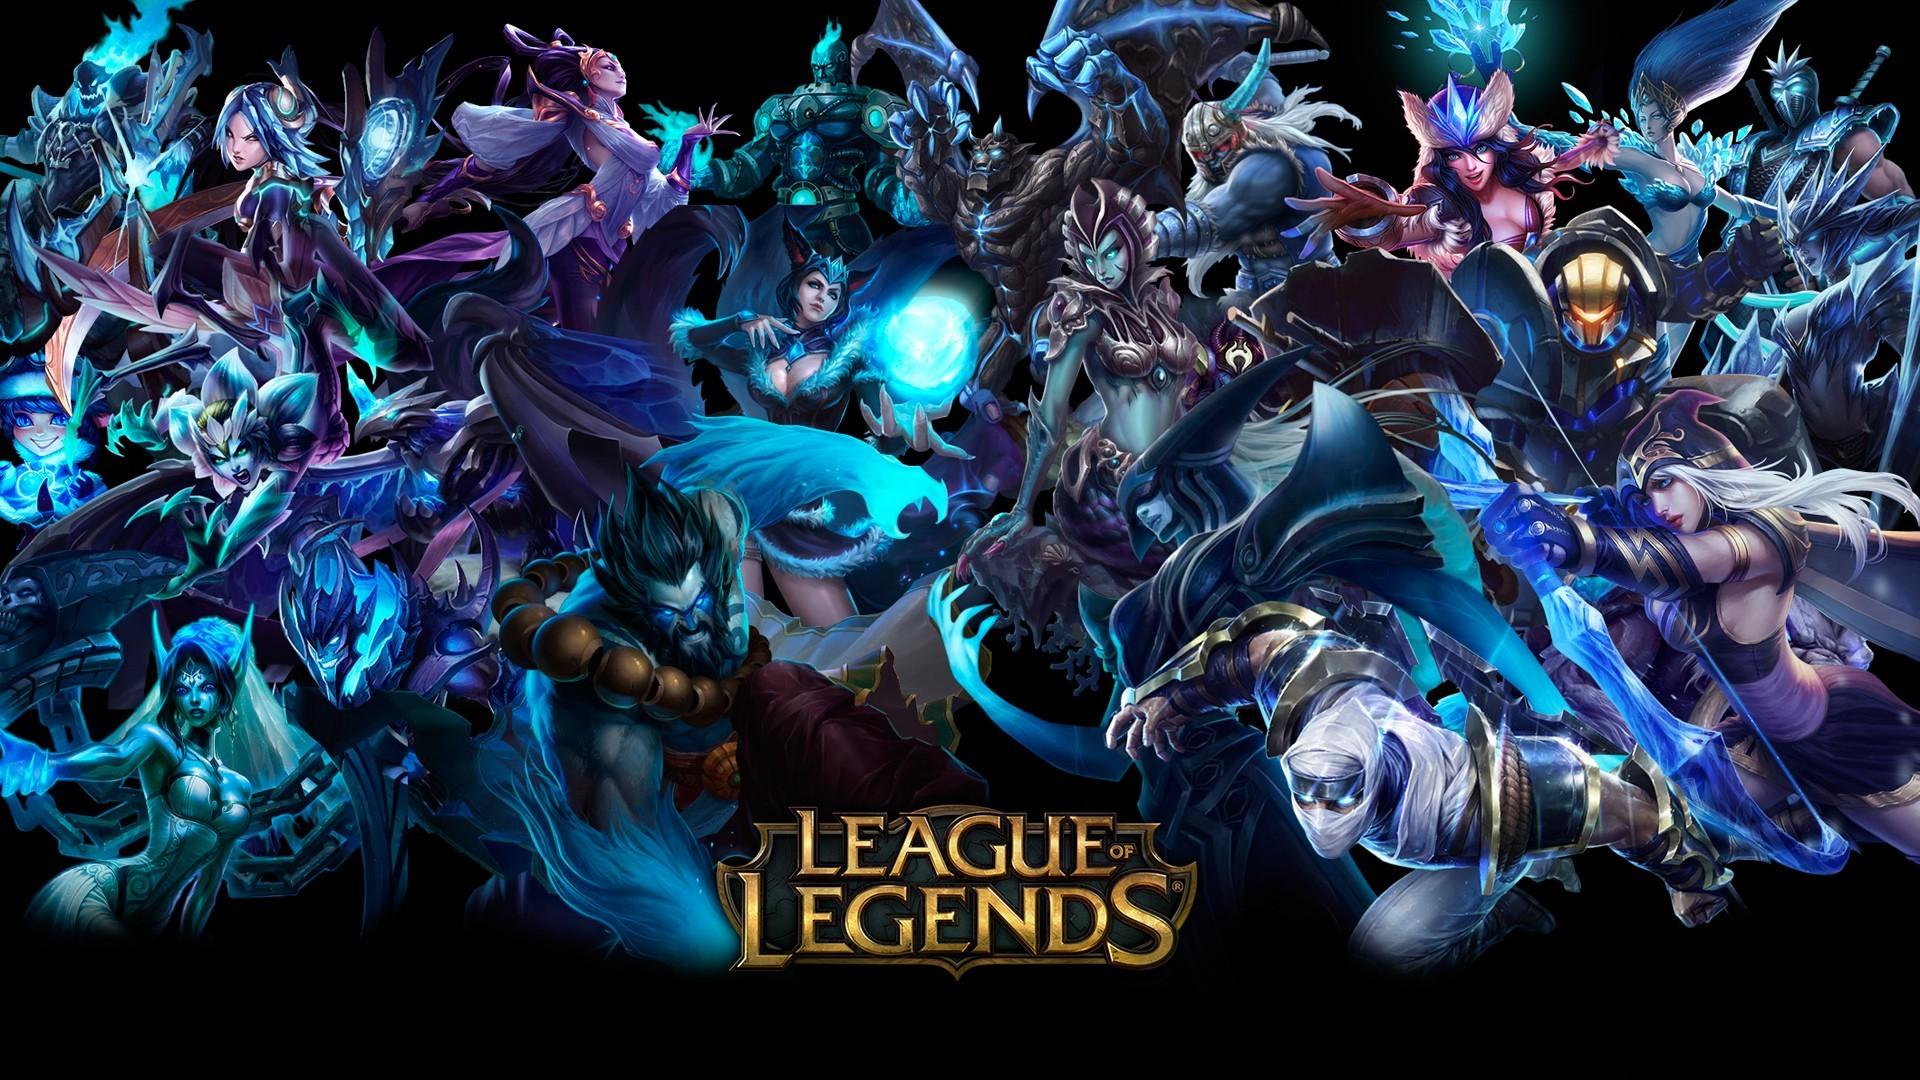 league of legends game wallpaper 007